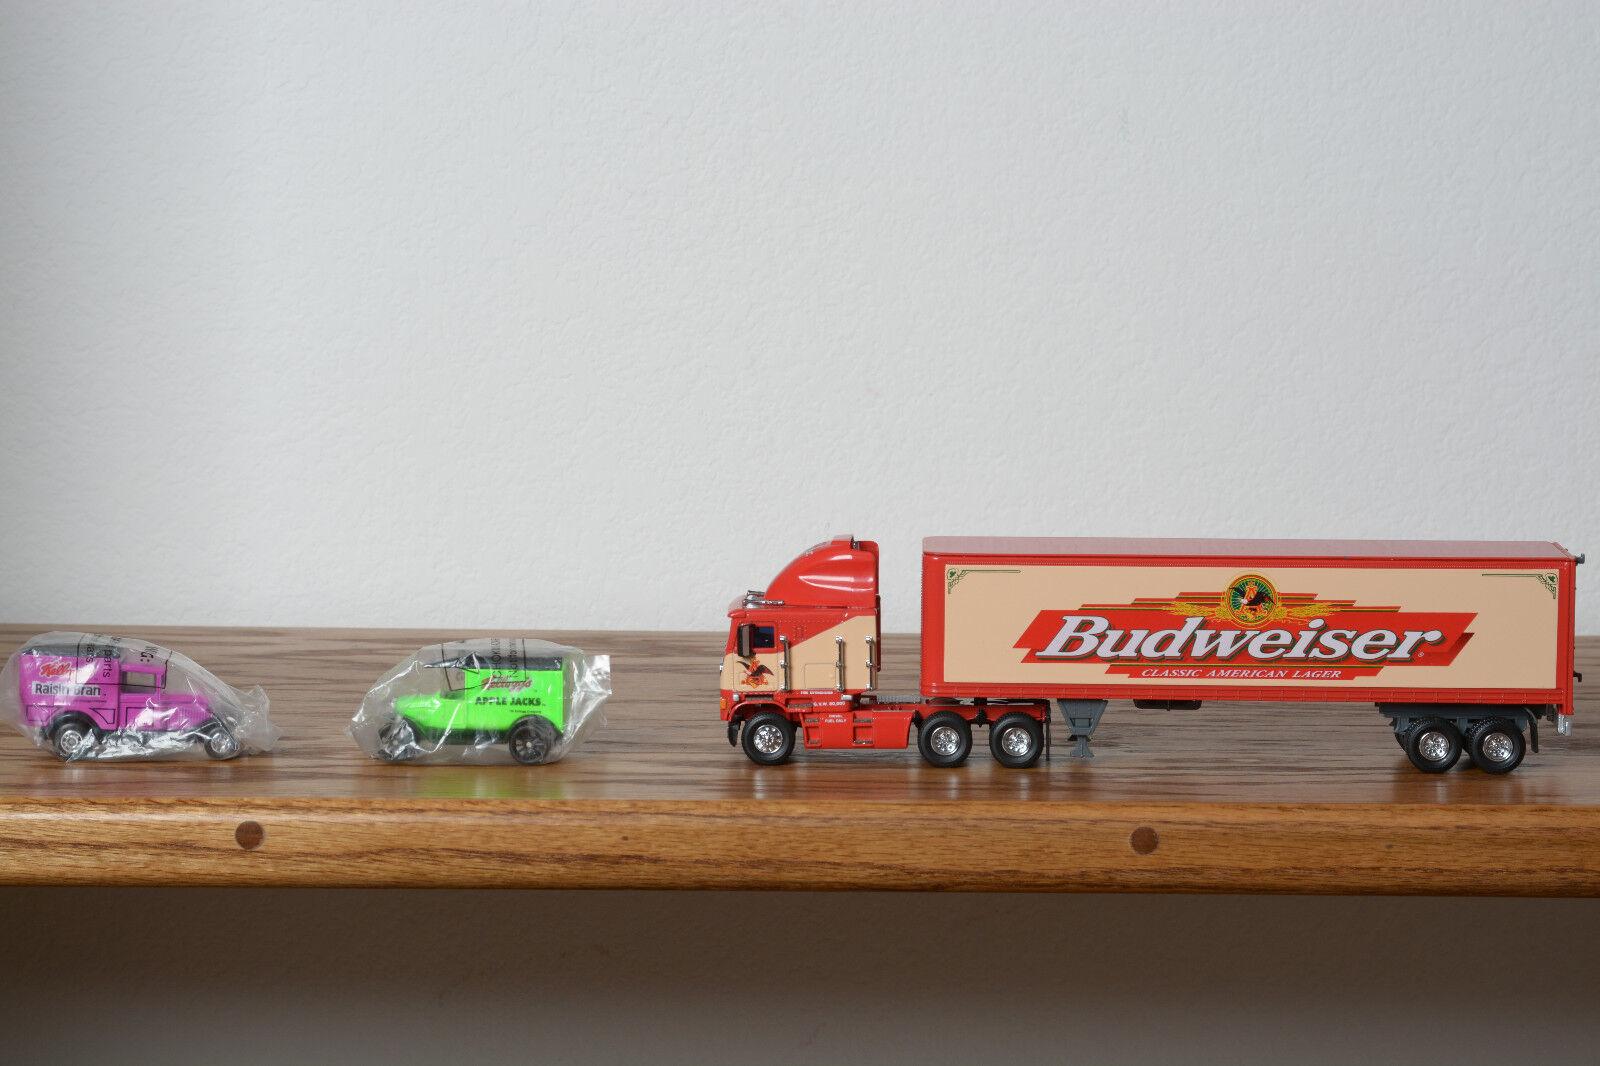 Matchbox Budweiser Semi Truck and 2 Kellogg Delivery Trucks